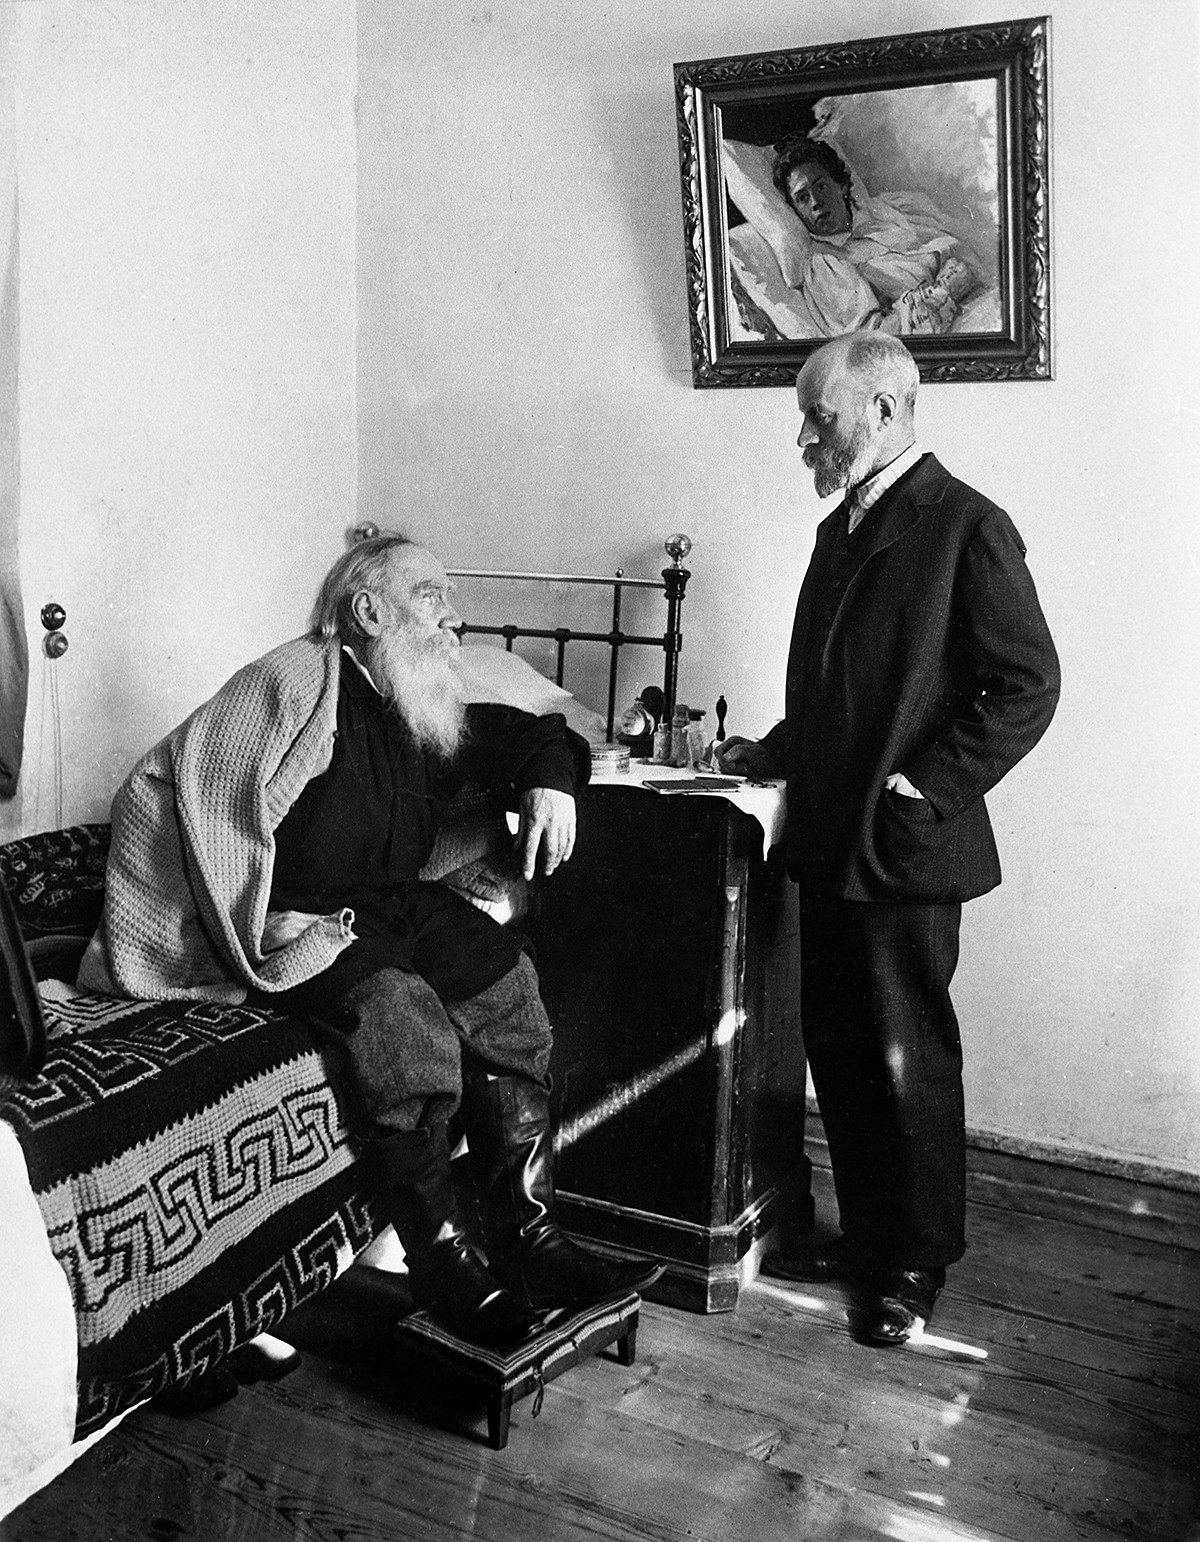 Tolstoï et le médecin Makovitski à Iasnaïa Poliana, en 1909